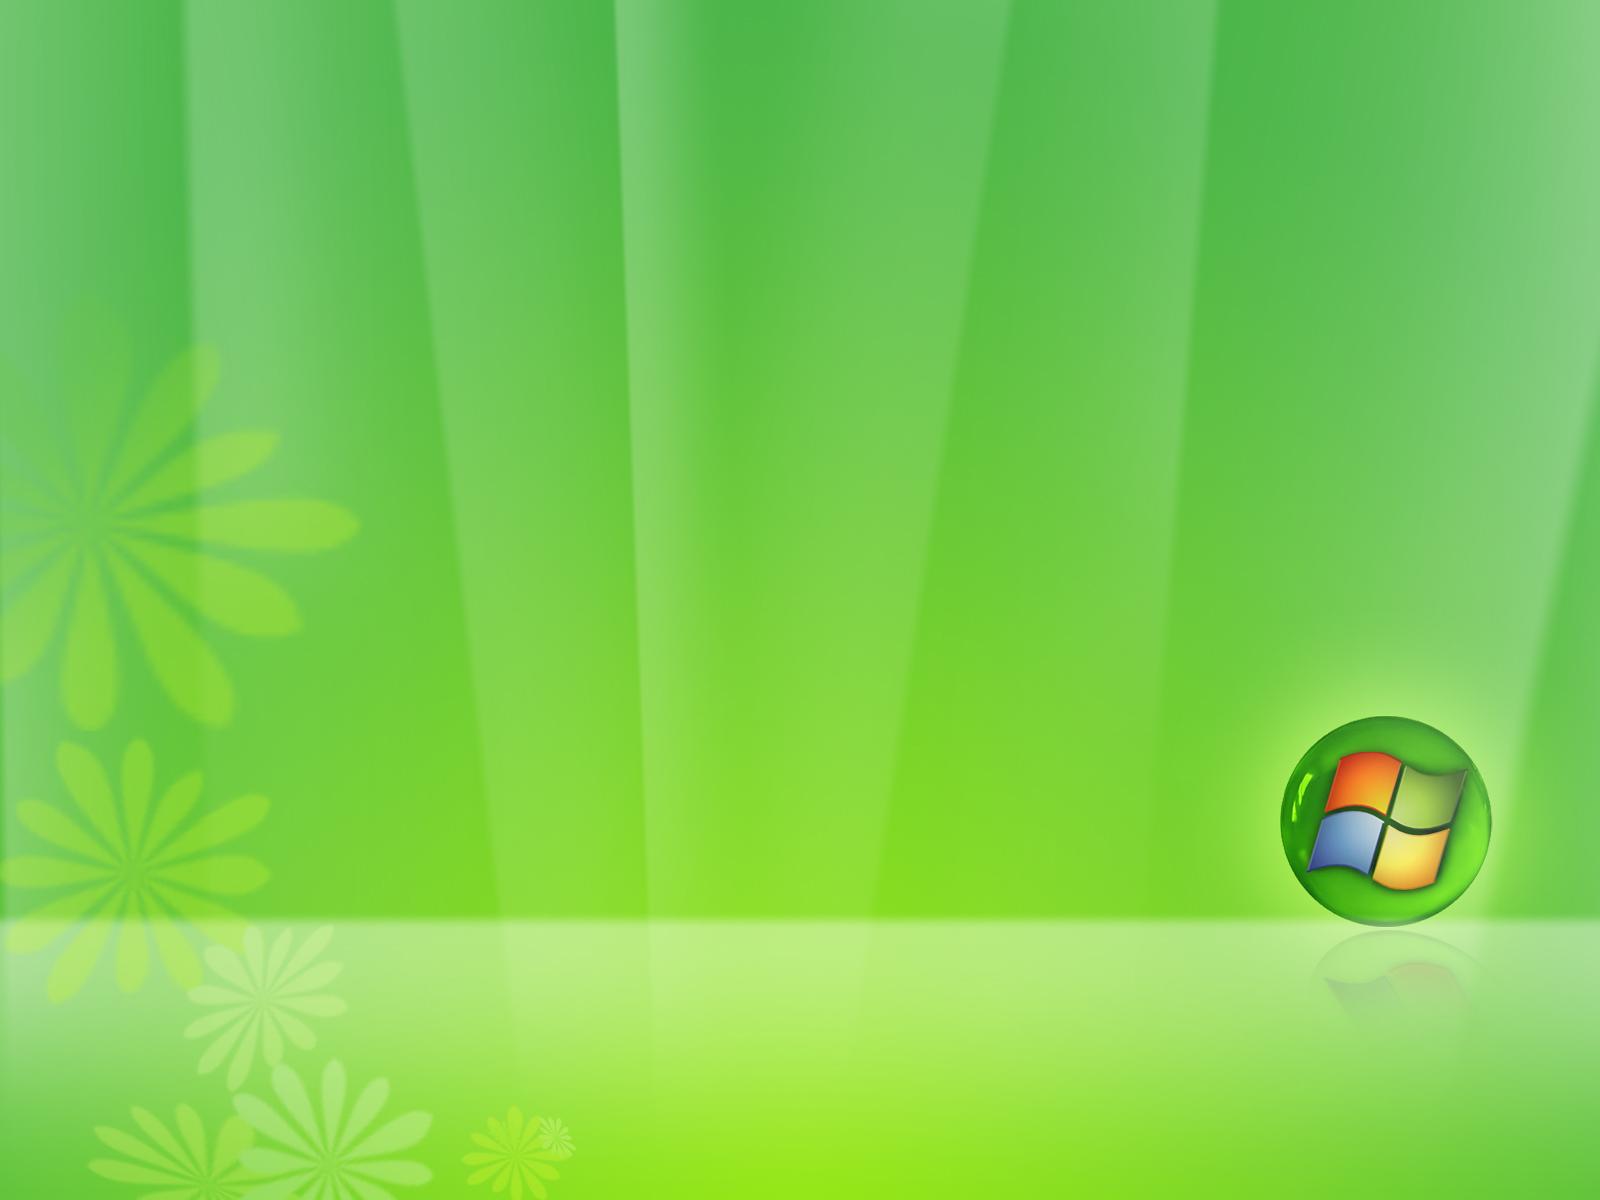 http://3.bp.blogspot.com/-j_XwhR98P7k/TruzwkppXzI/AAAAAAAARCE/N1qS2xv9Rtk/s1600/Mooie-windows-achtergronden-leuke-hd-windows-wallpapers-afbeelding-plaatje-27.jpg